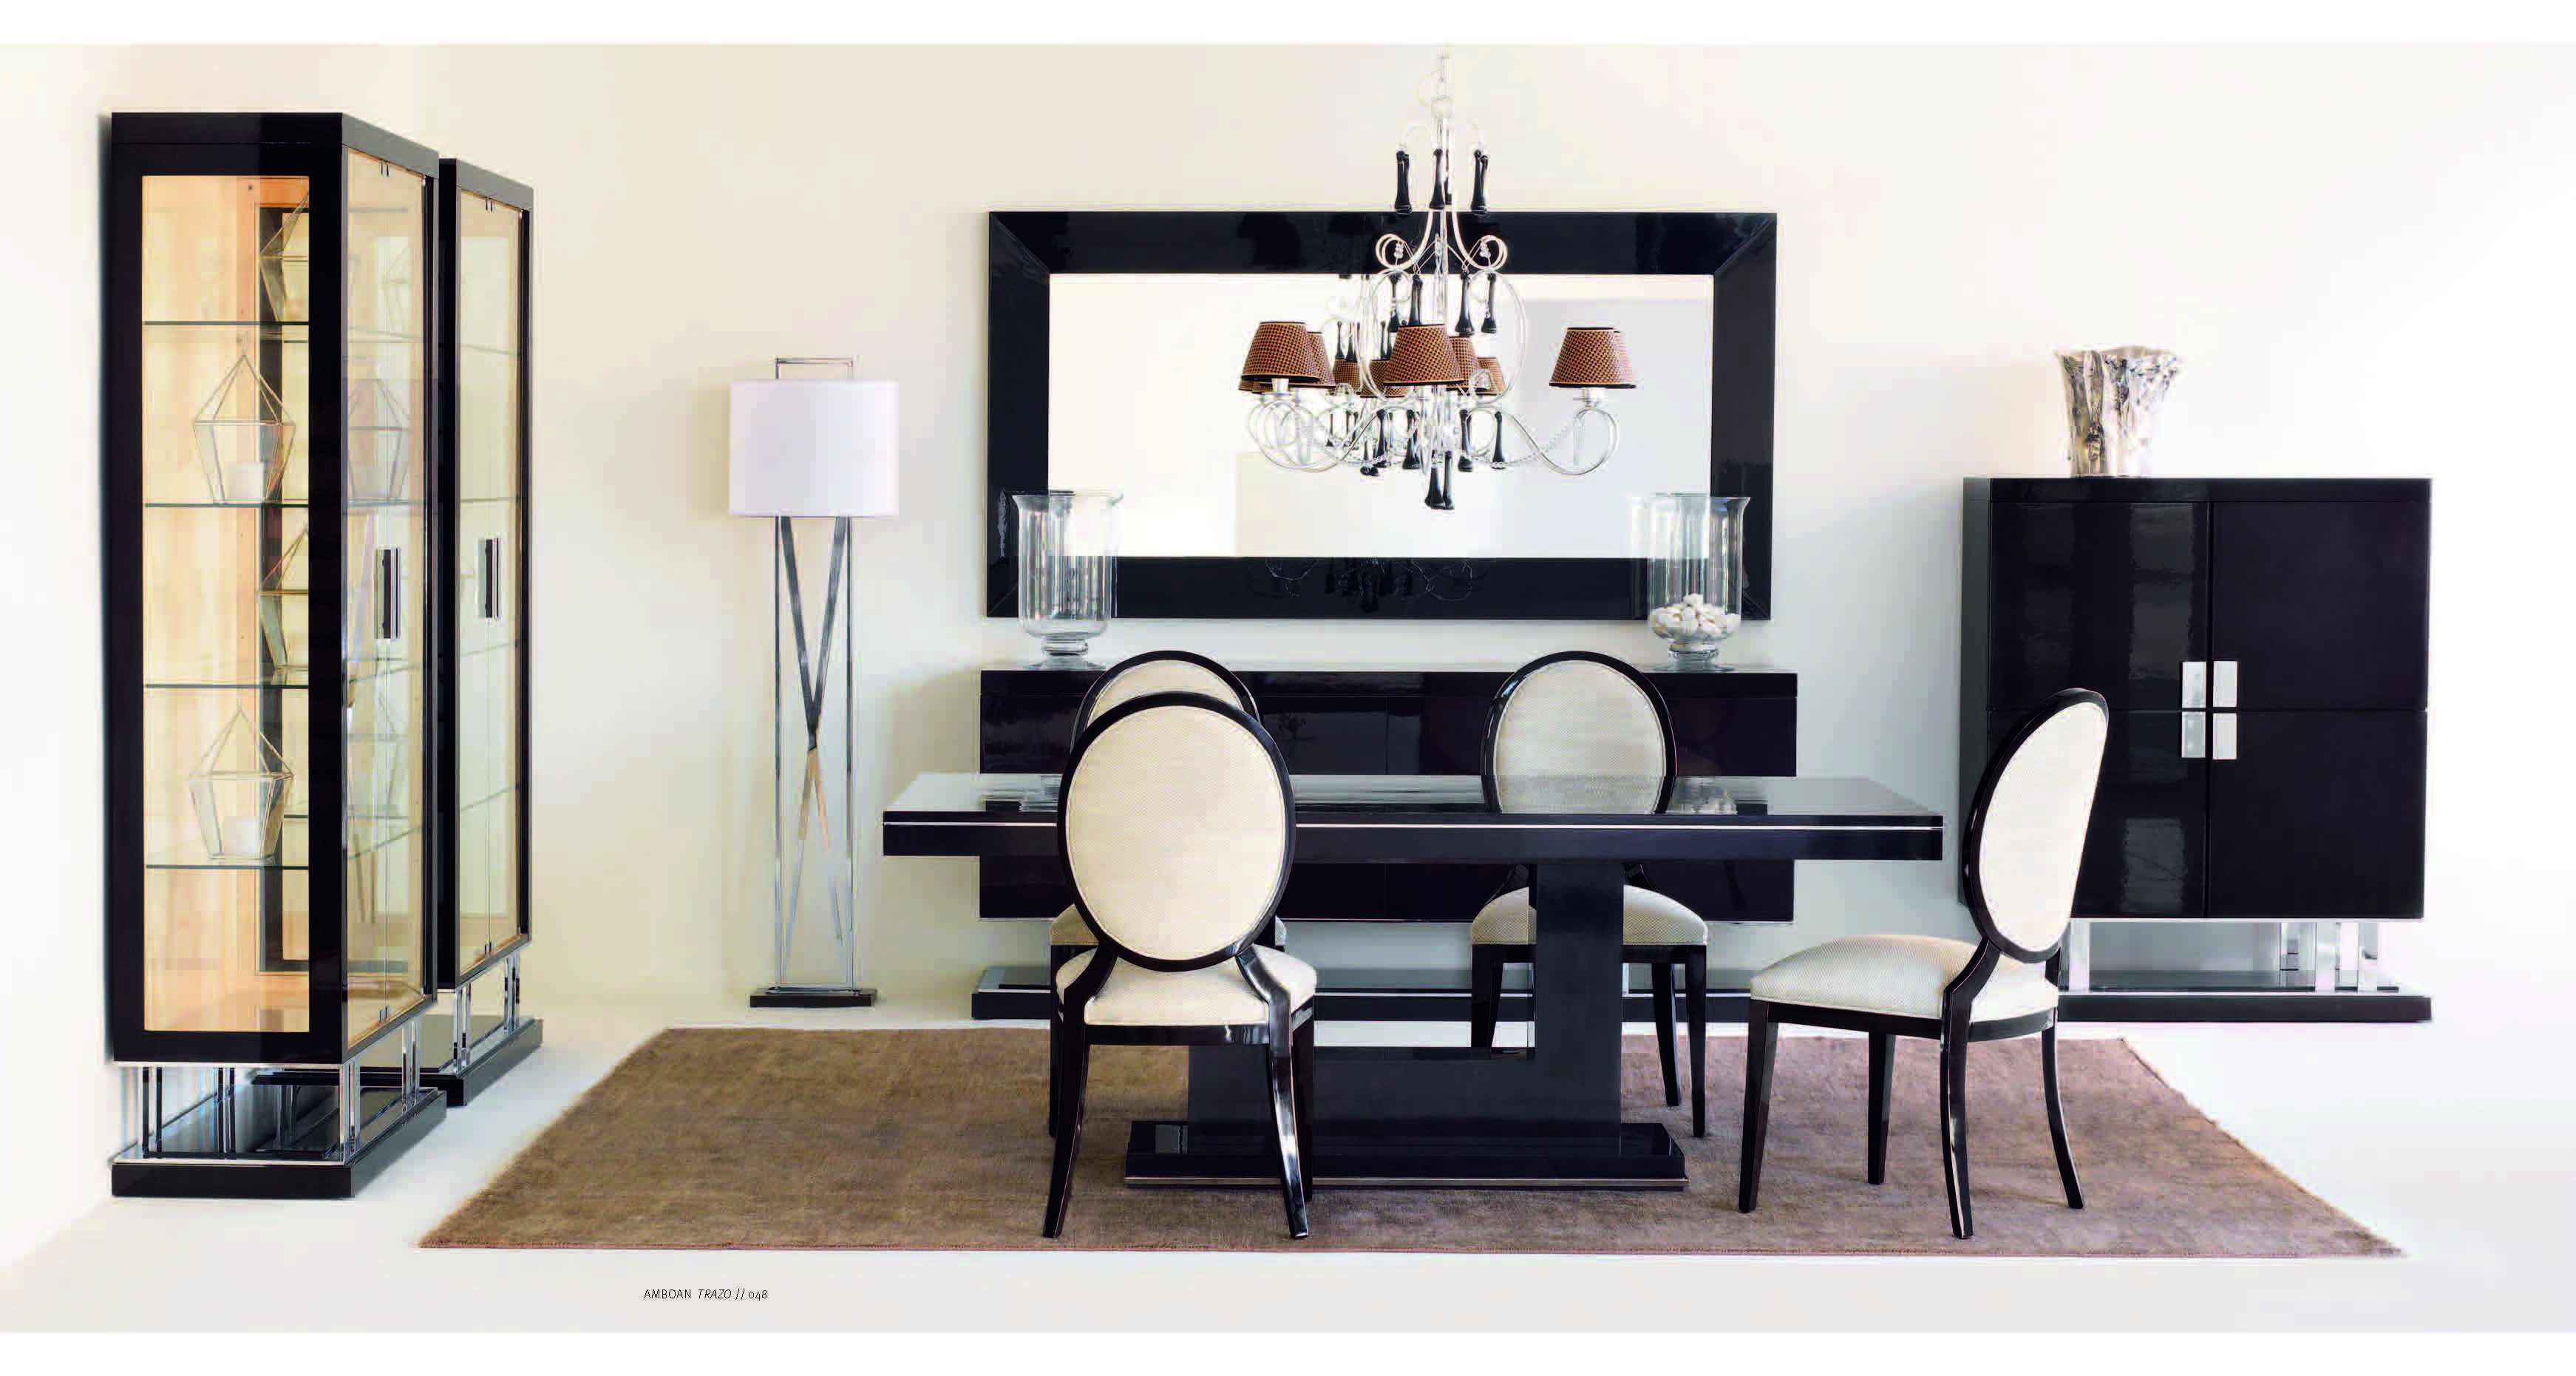 Mueble clasico valencia muebles fuensalida muebles - Muebles clasicos valencia ...